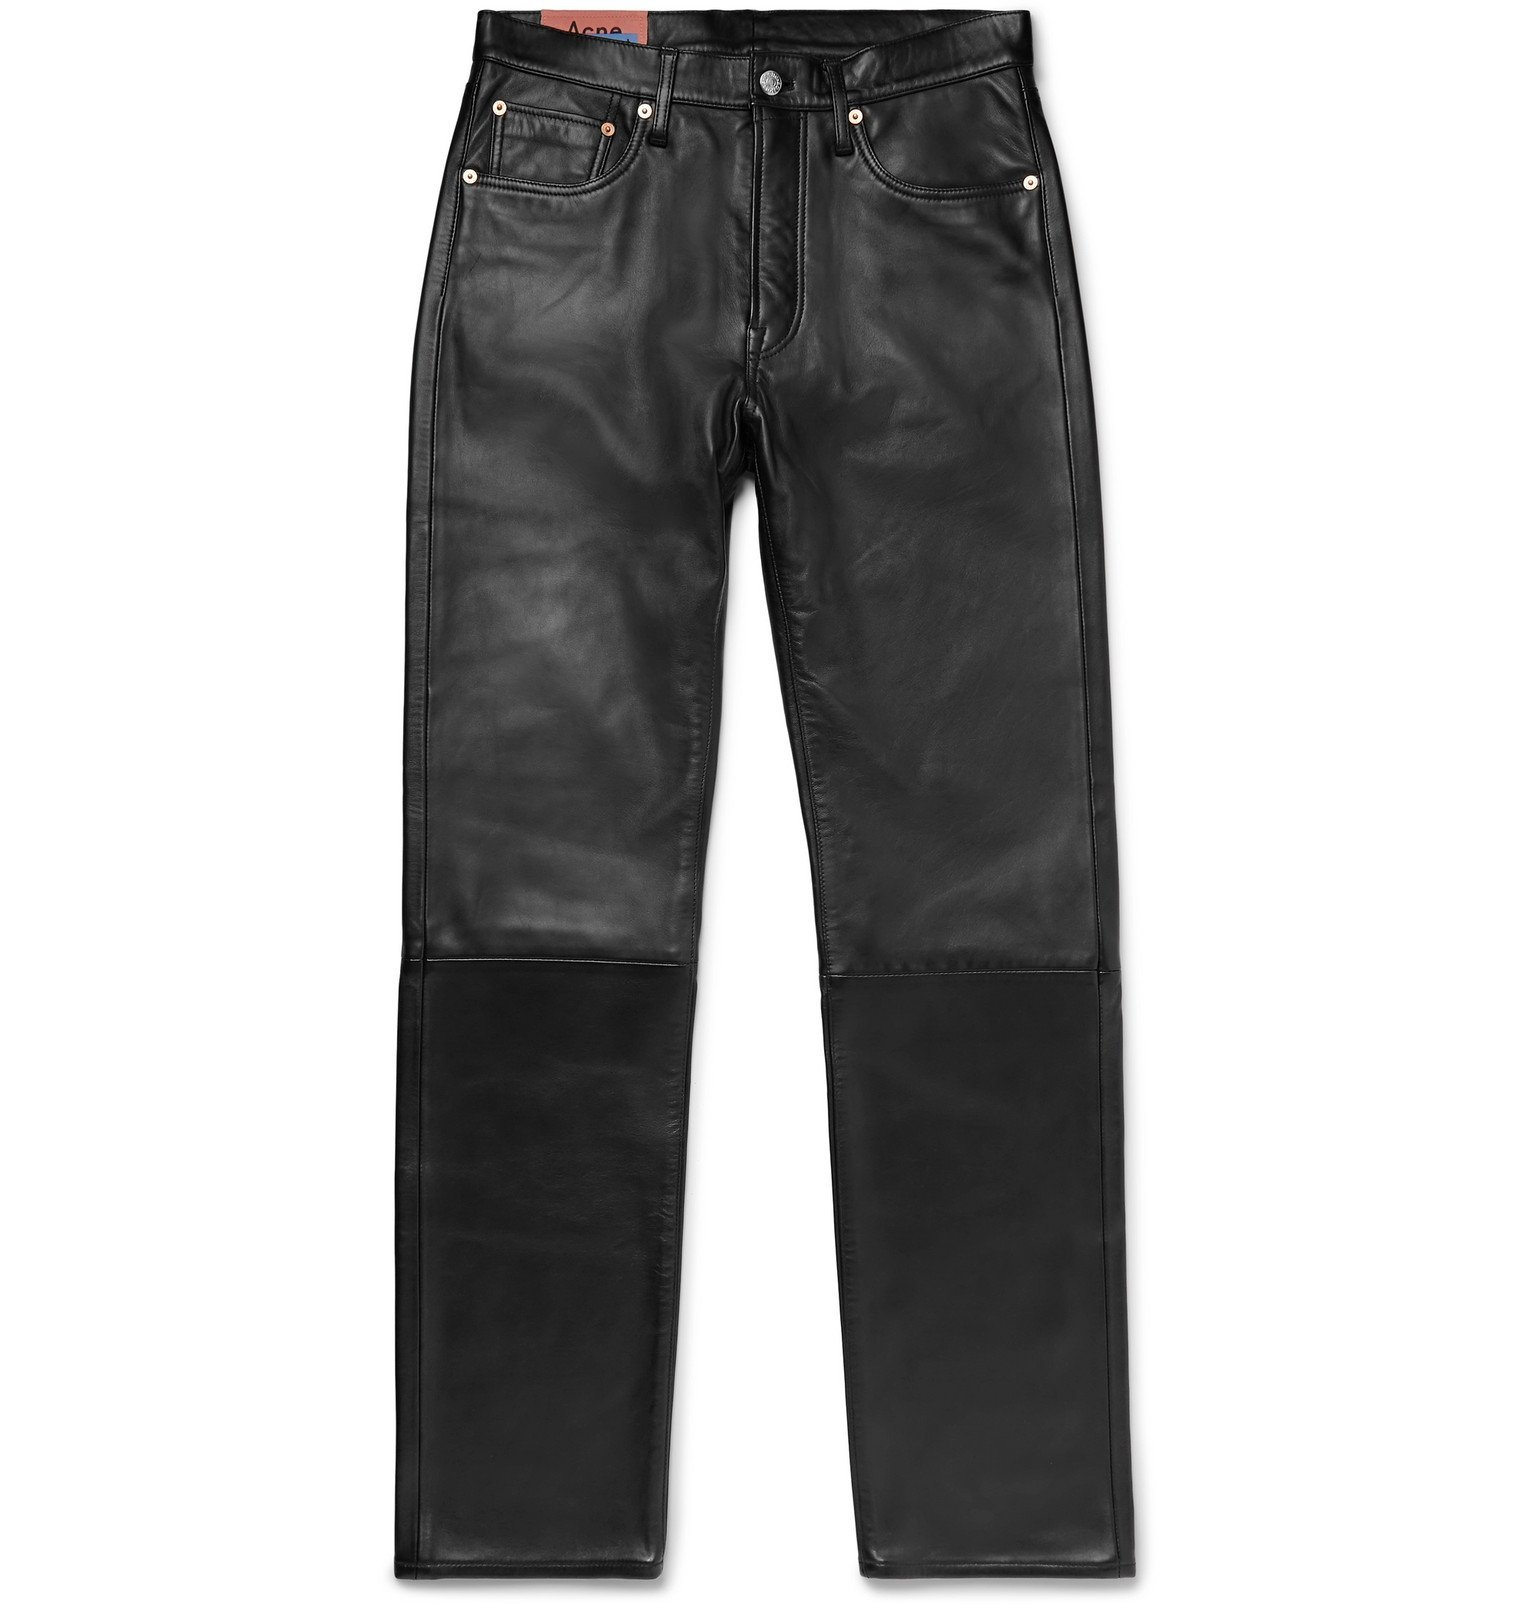 Acne Studios - 1996 Slim-Fit Leather Trousers - Black